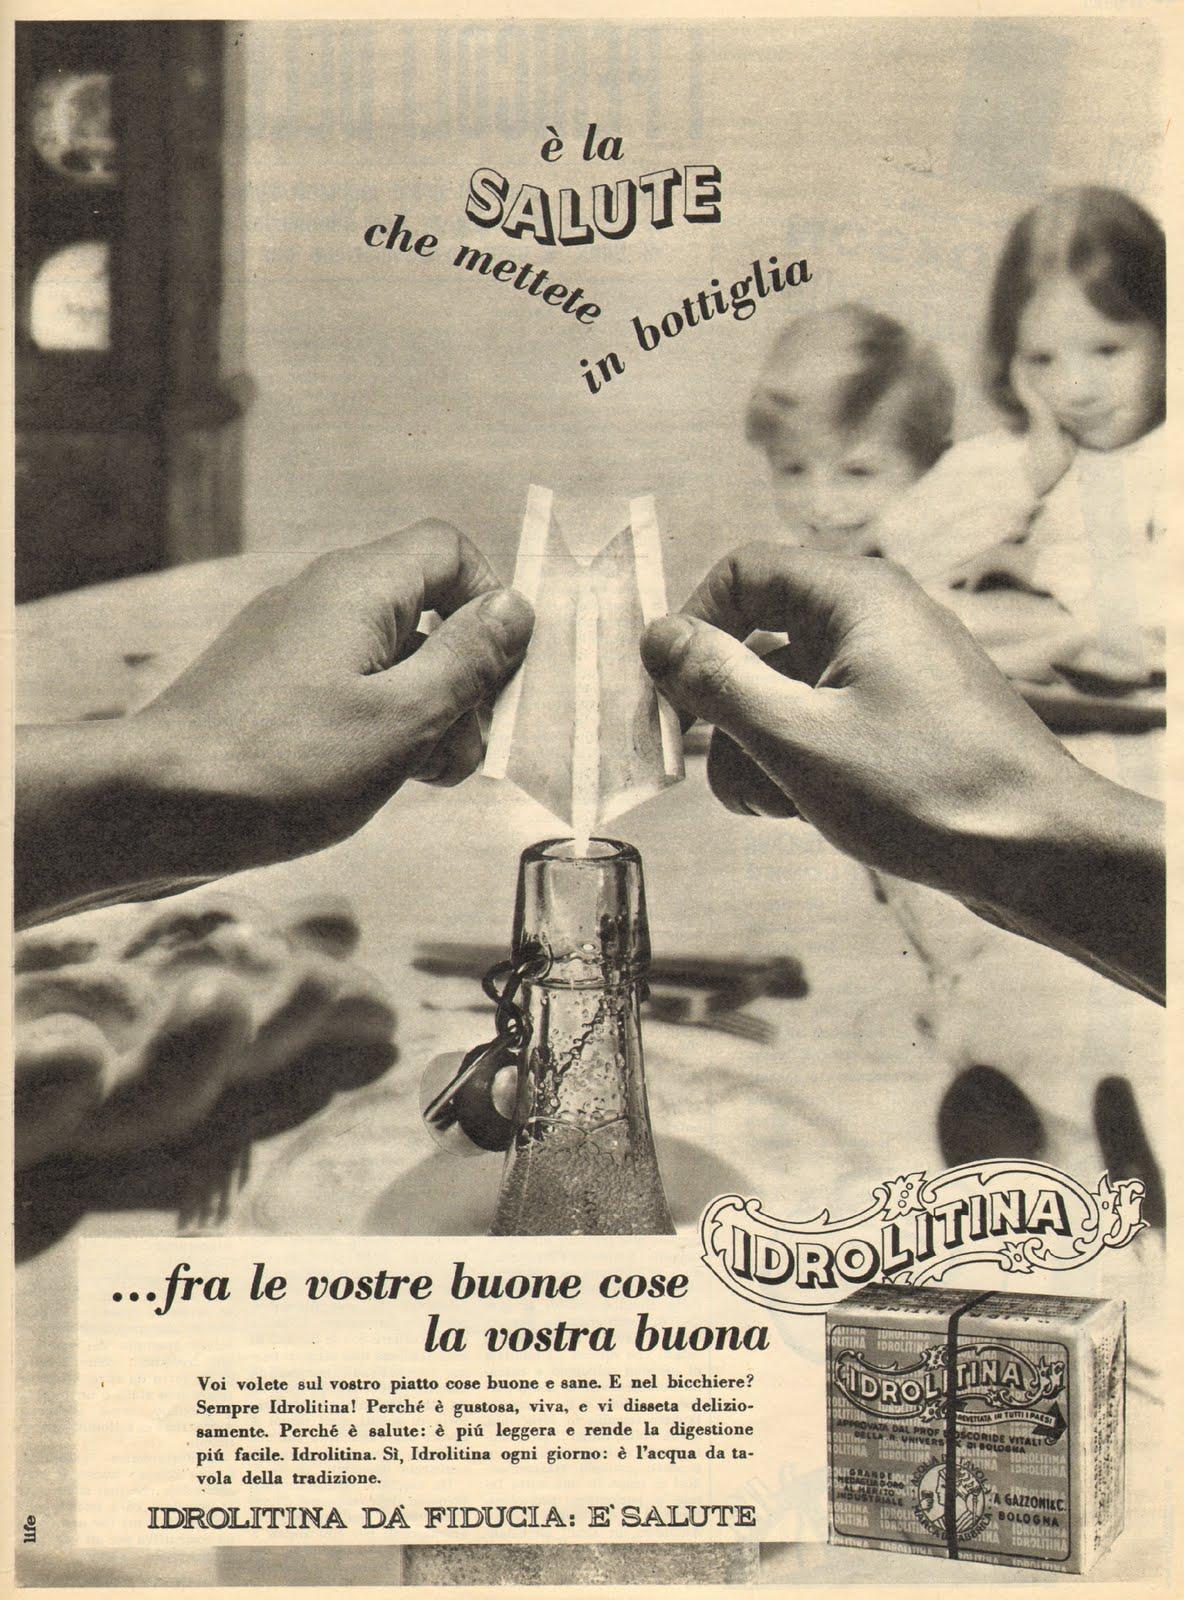 frizzina 1962 carosello salute preparazione bustina idrolitina